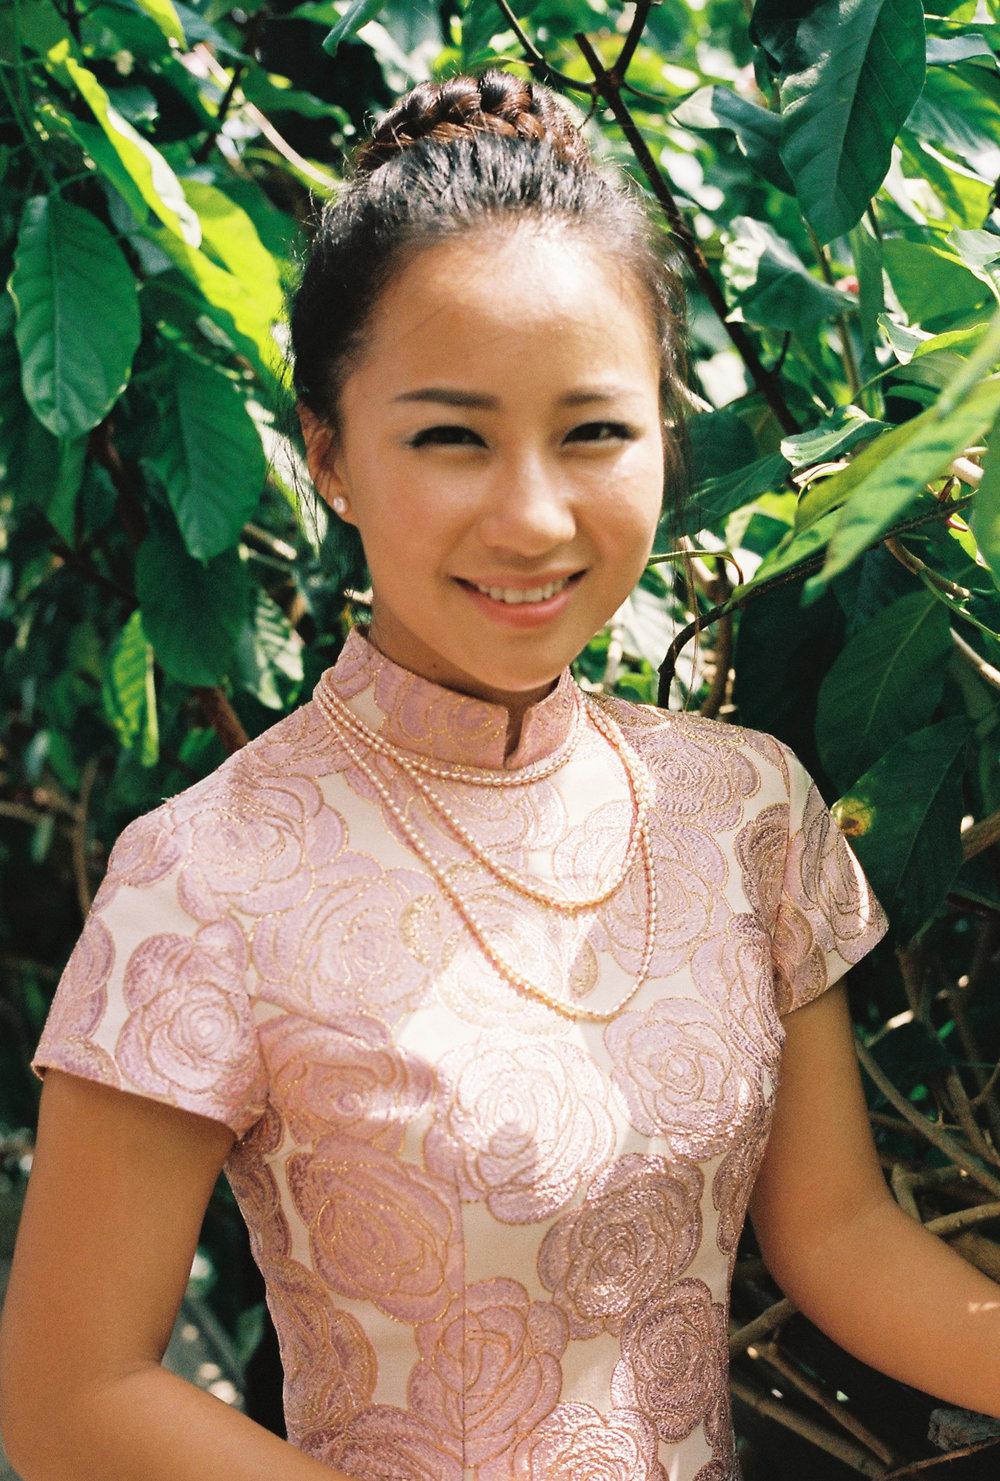 Tailandia, Contax G1, Kodak POrtra 400